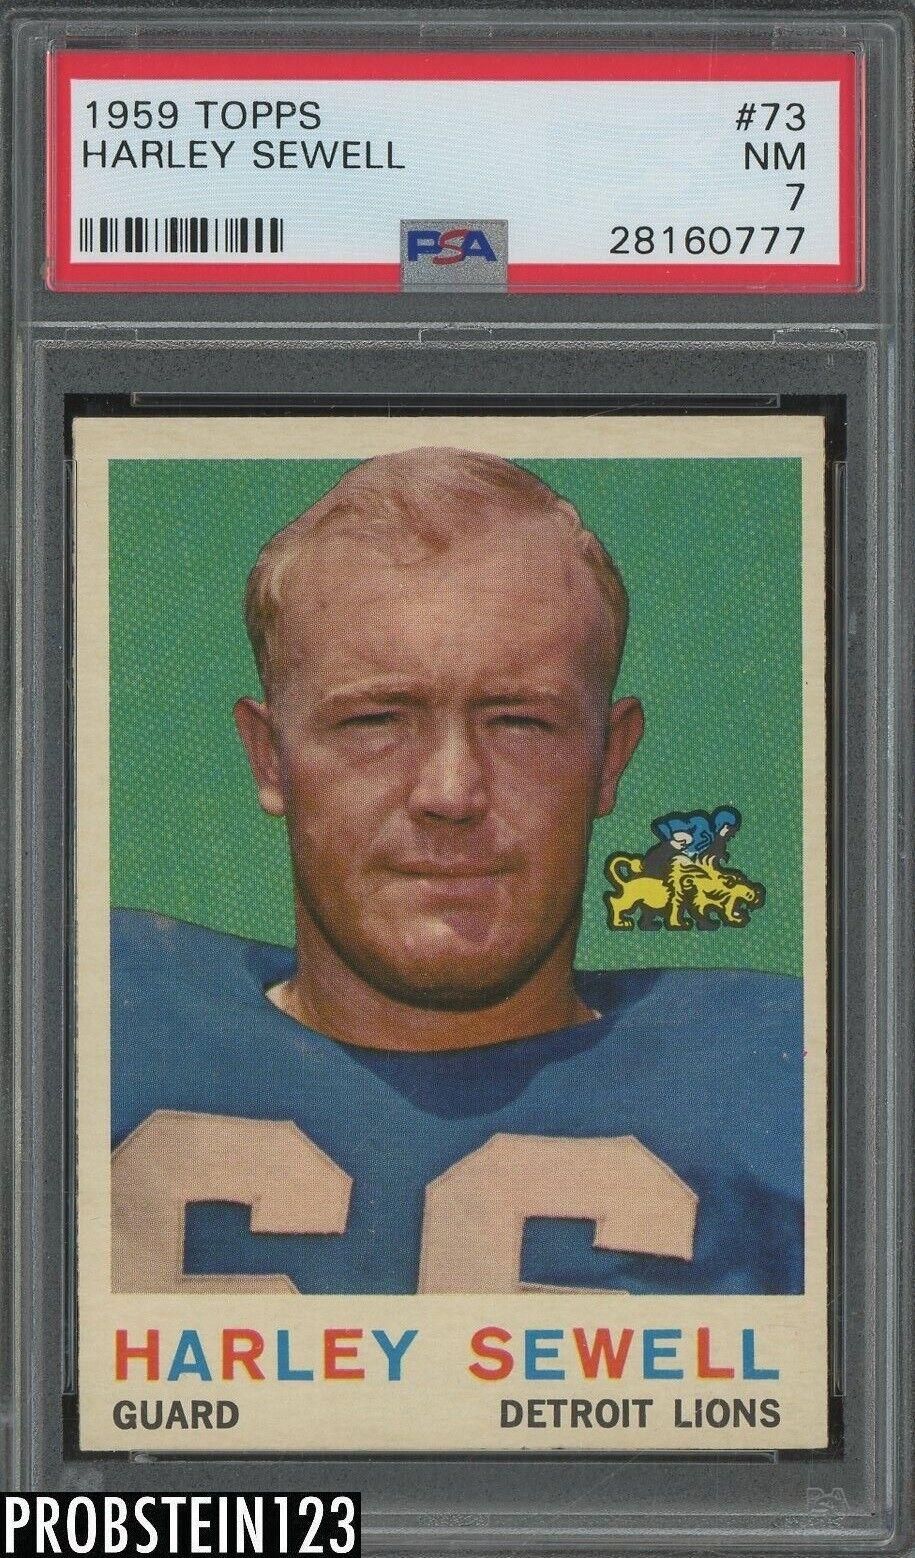 1959 Topps Football 73 Harley Sewell Detroit Lions PSA 7 NM - $7.50